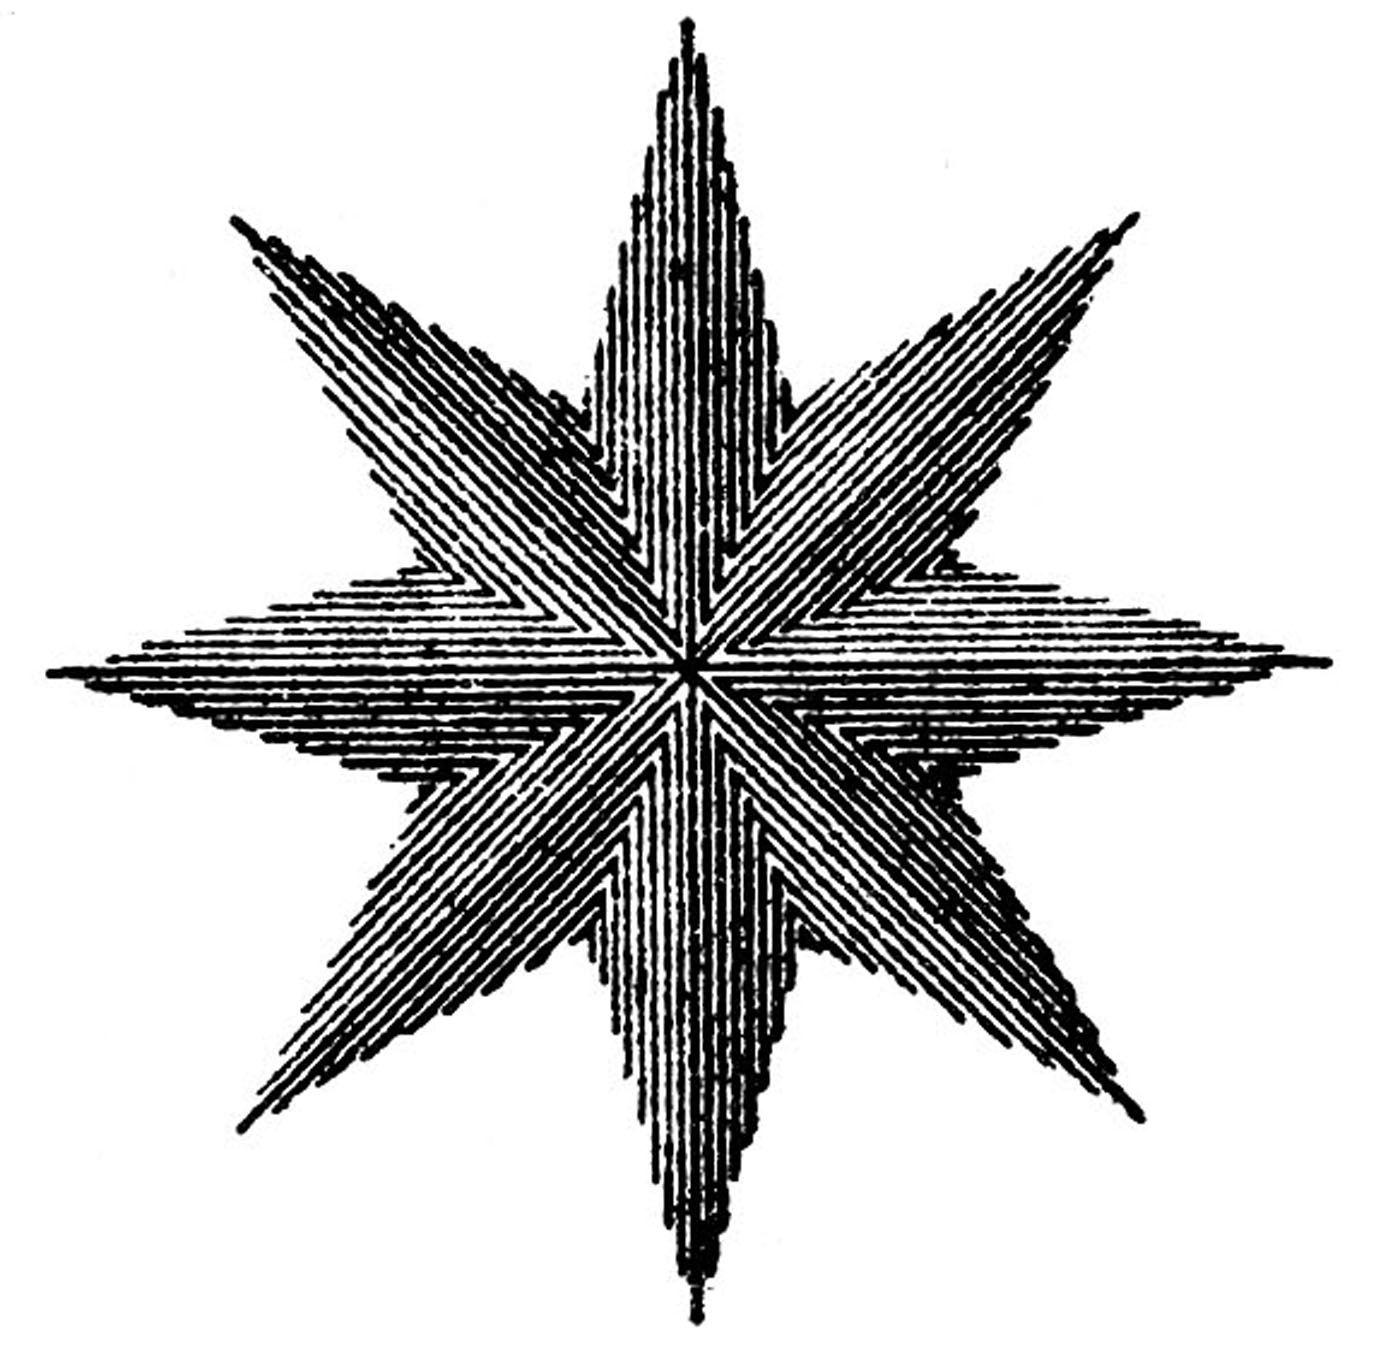 Vintage Steampunk Clip Art Compass Rose Star Compass